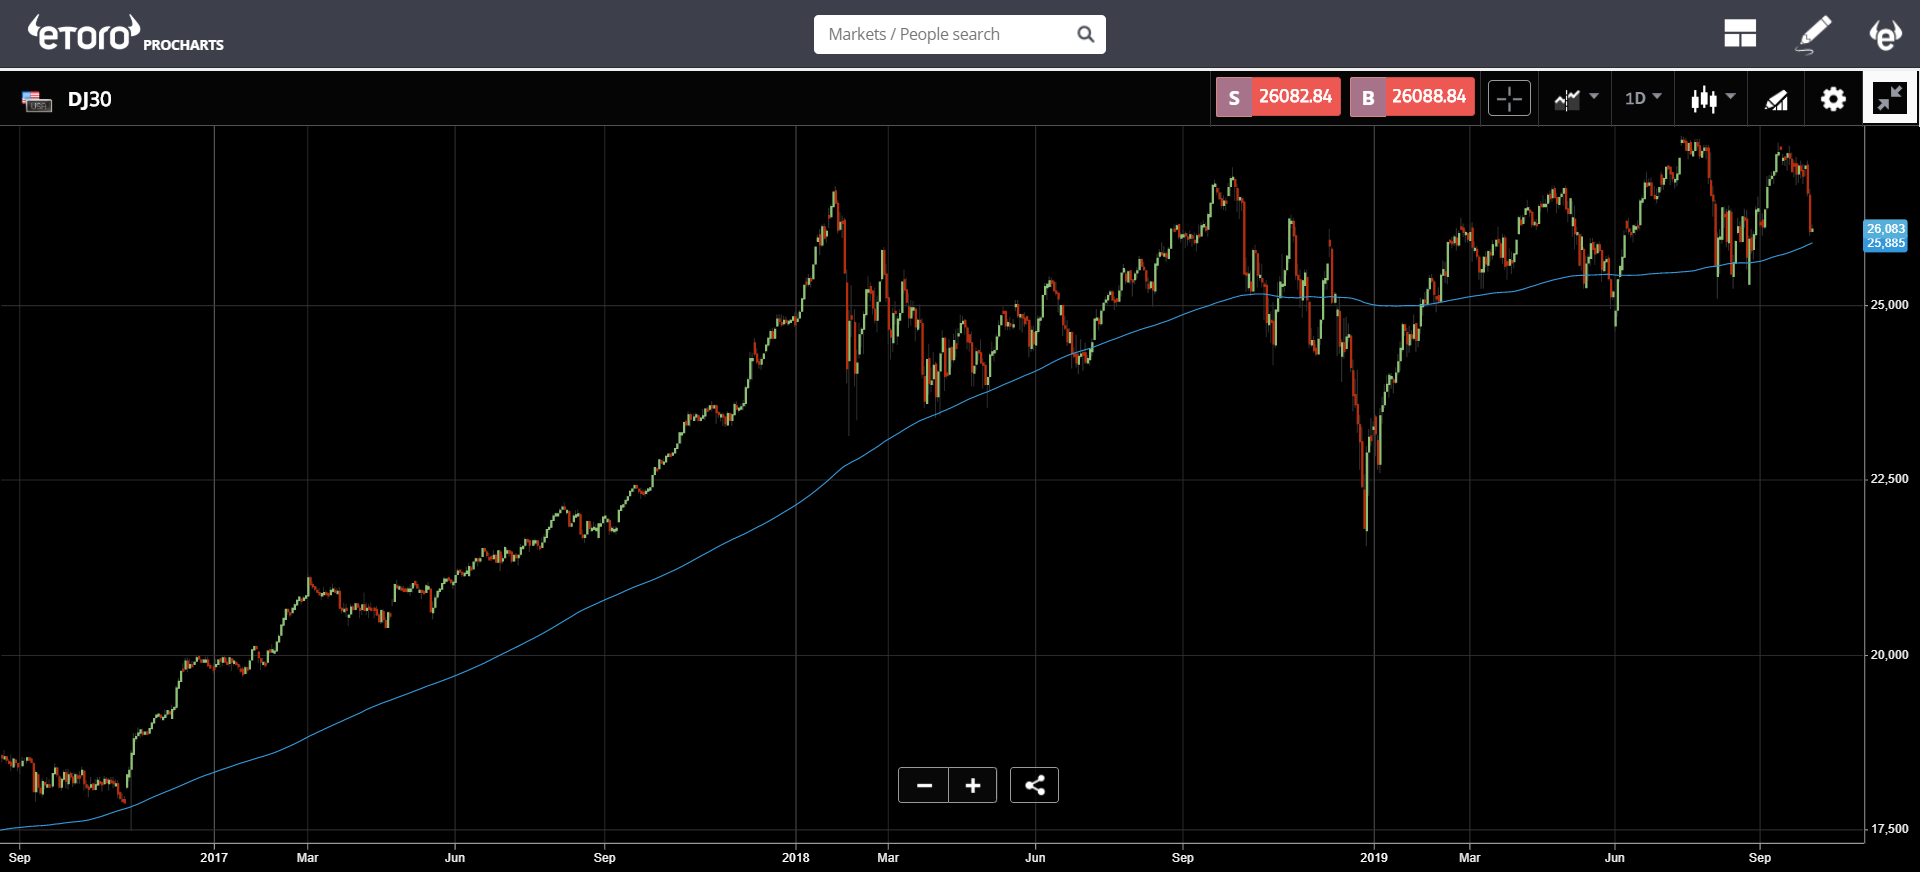 market, cryptocurrency, crypto, bitcoin, blockchain, ethereum, trading, stock, exchange,